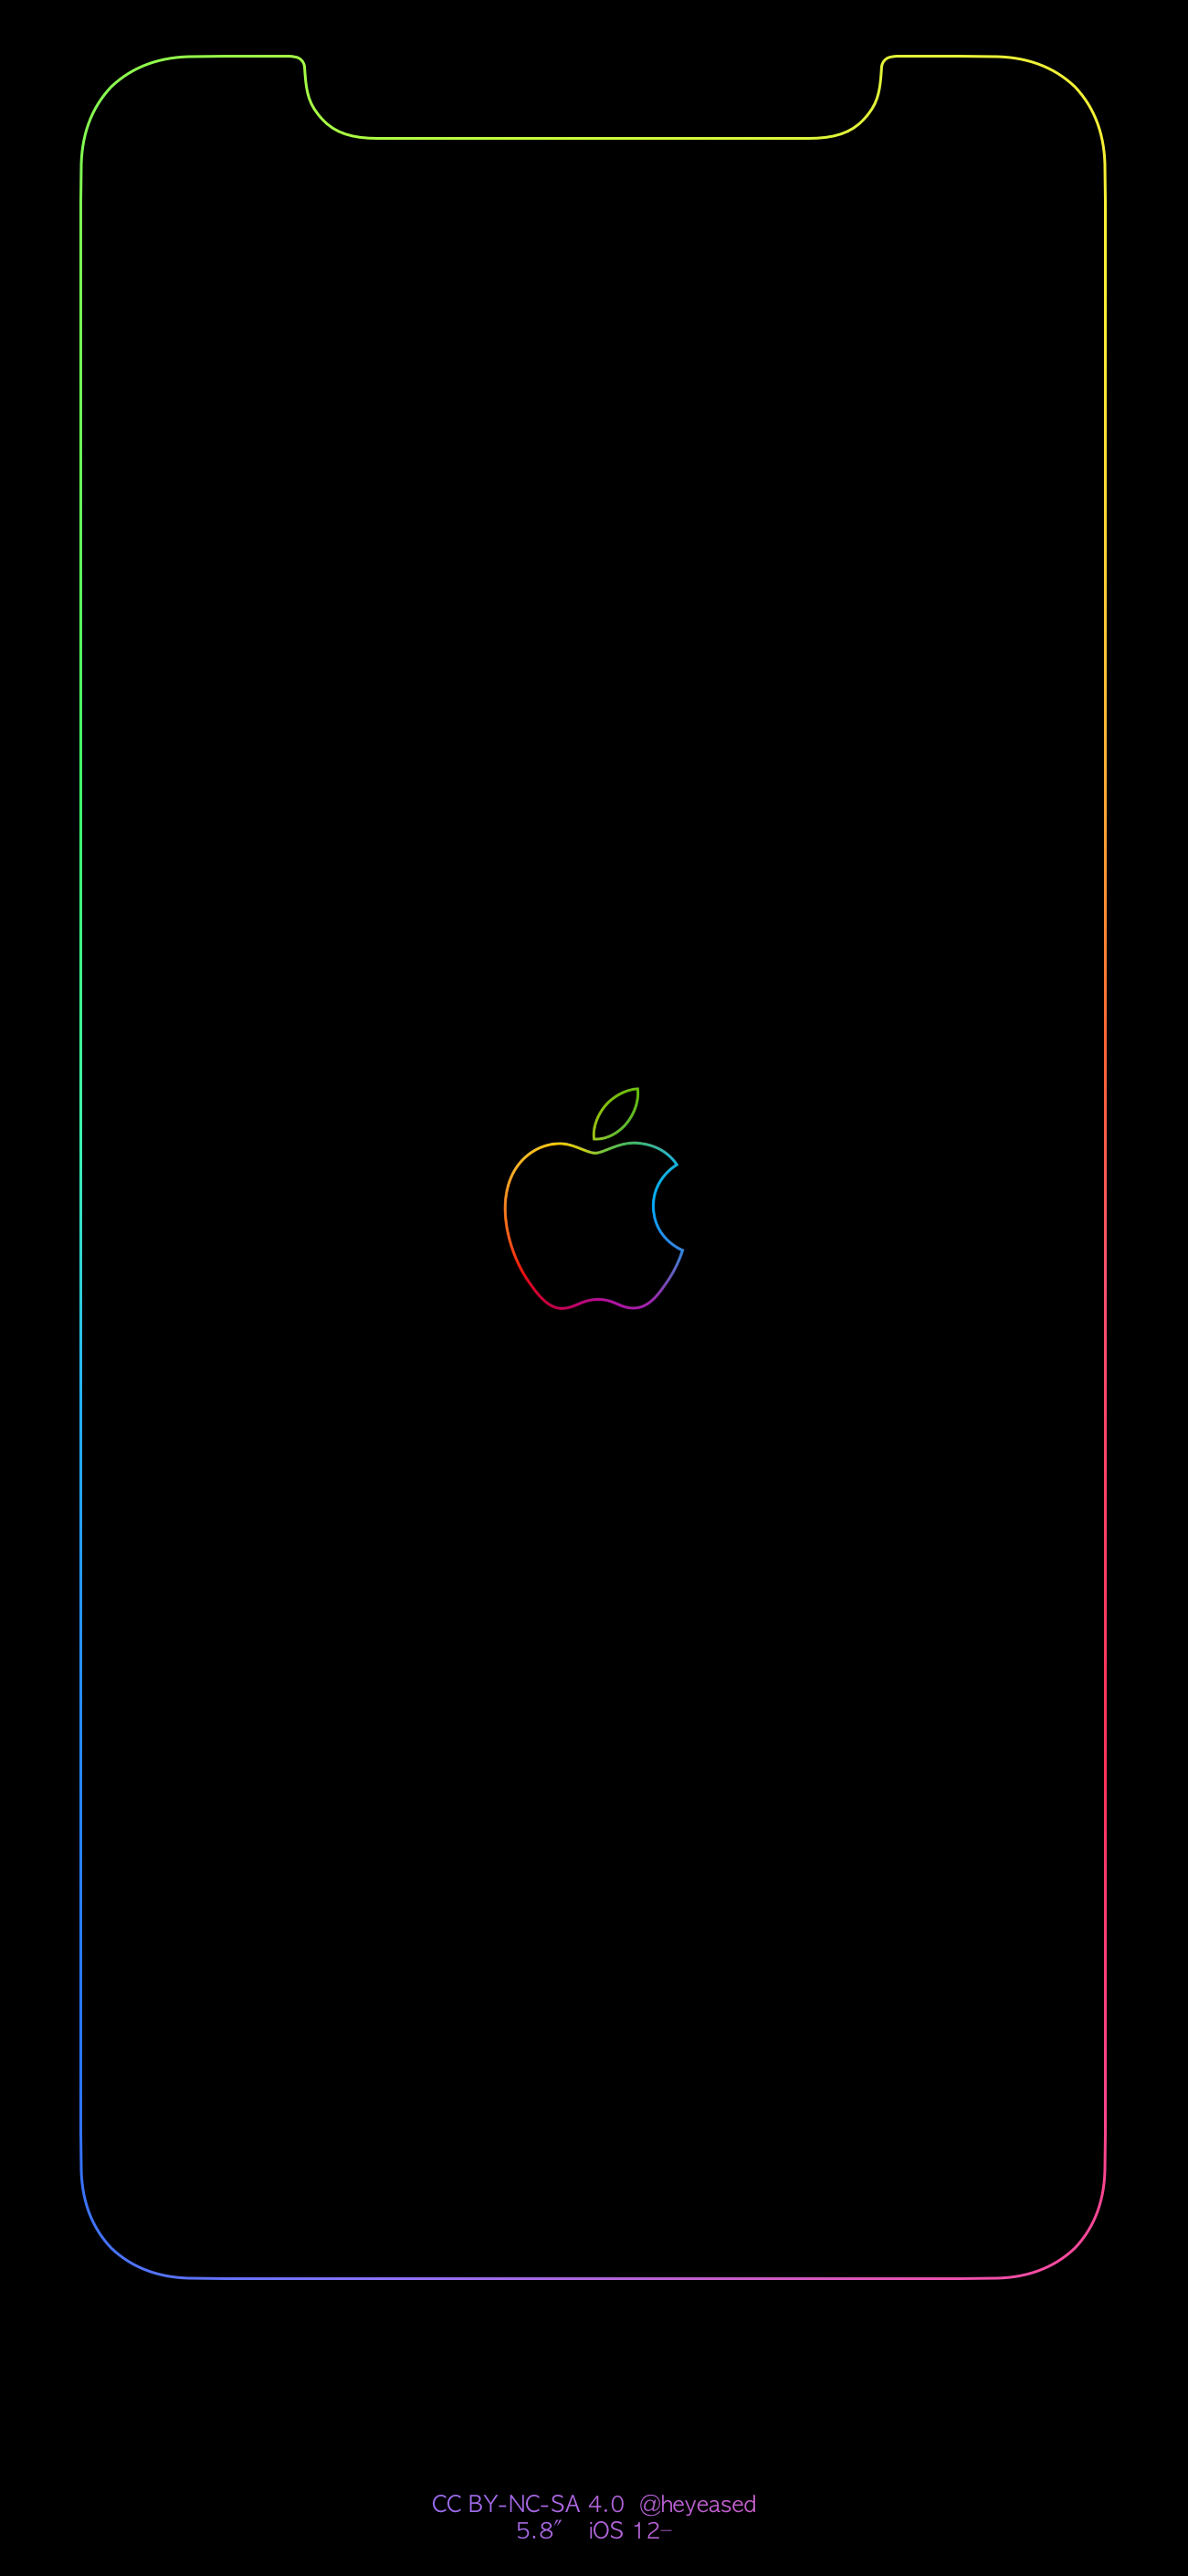 42 8 Apple Iphone Wallpaper On Wallpapersafari